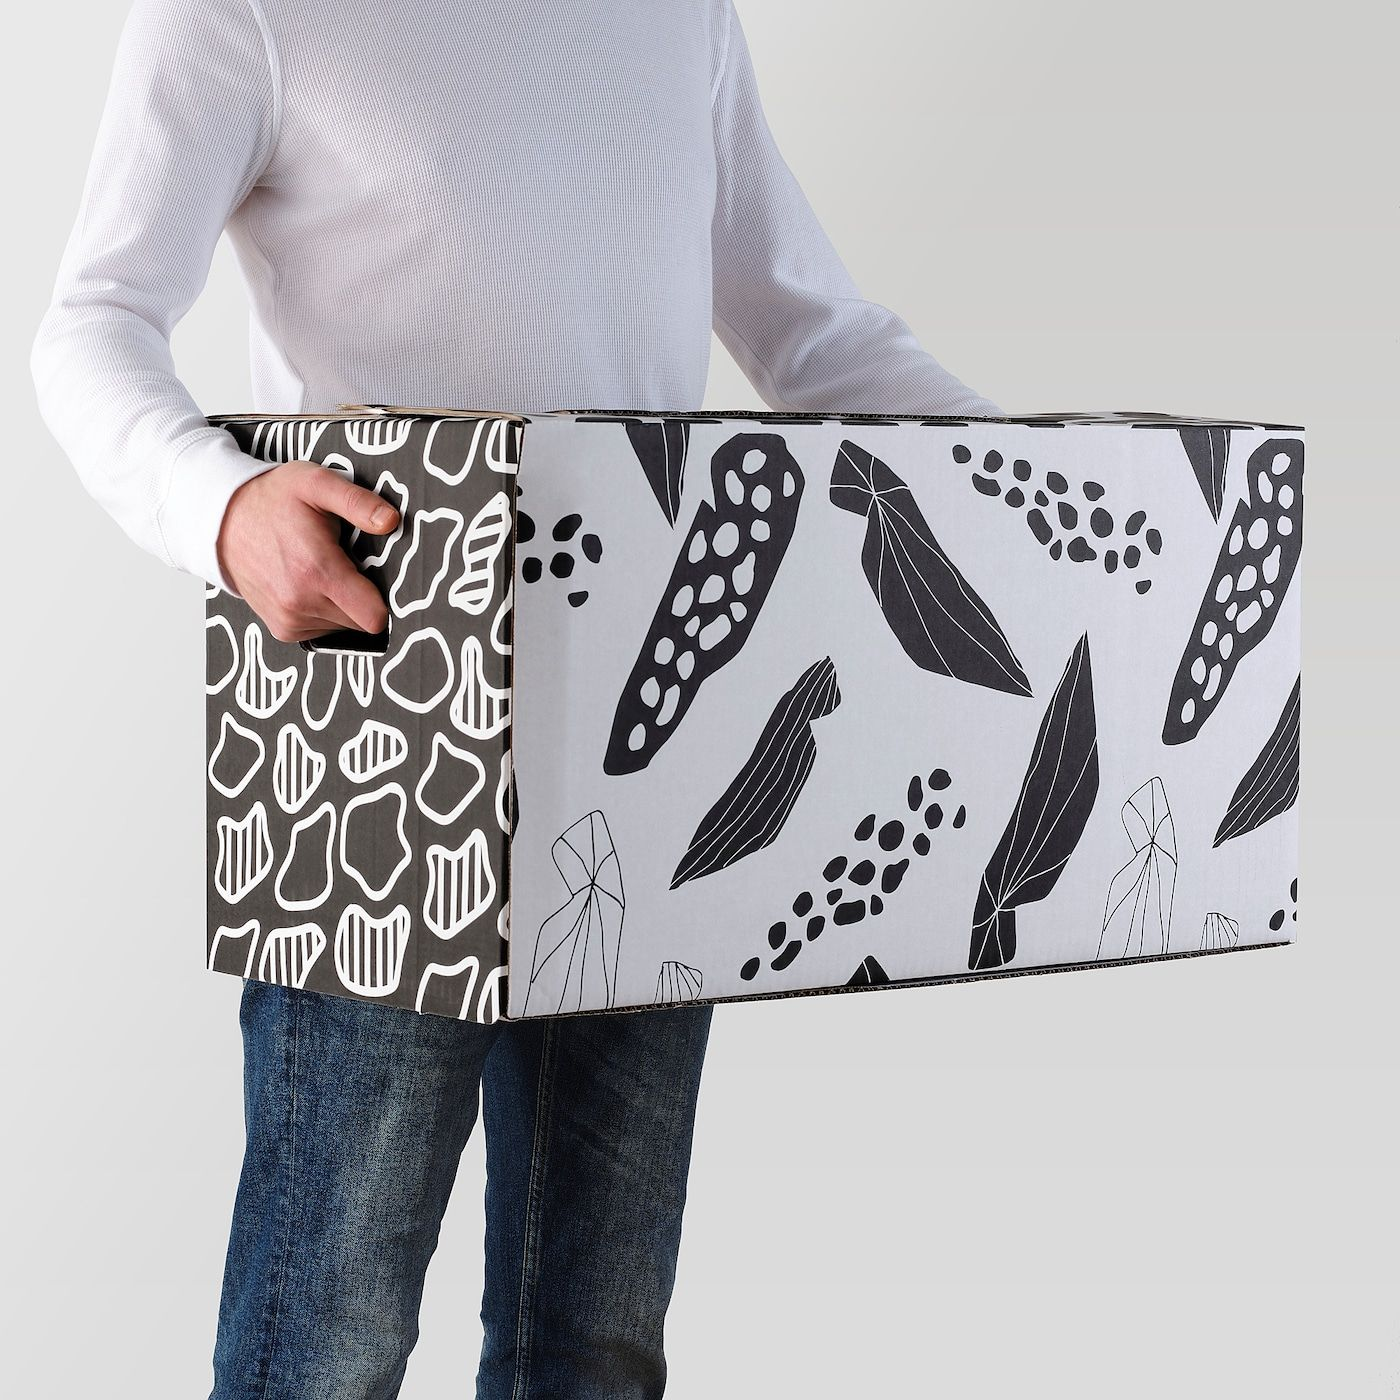 Ombyte Carton D Emballage Blanc Noir Emballage Carton Boite Demenagement Et Ikea